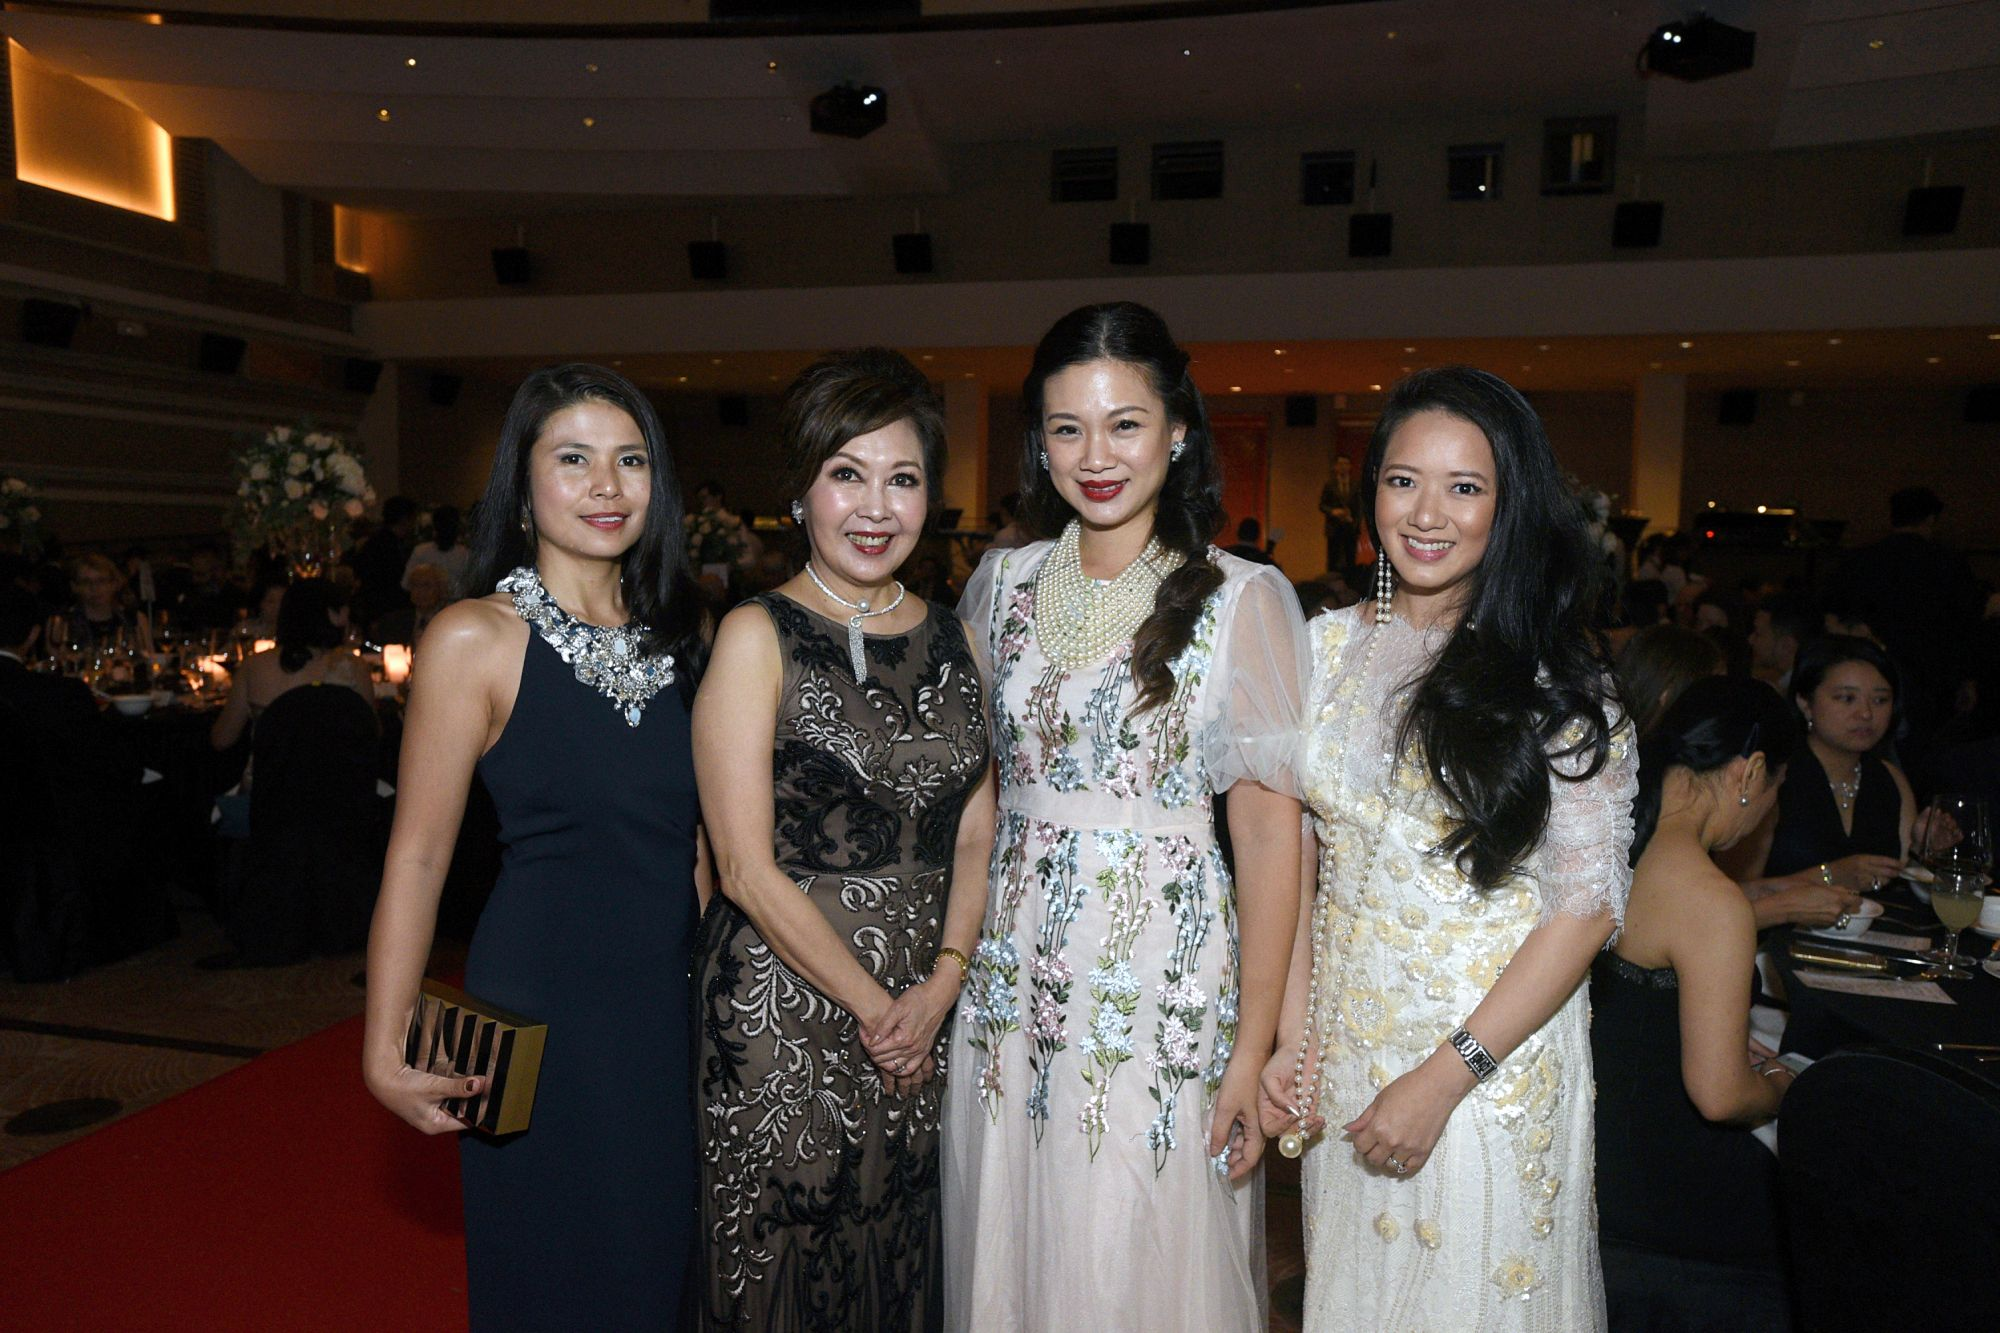 Marilyn Lum, Laura Hwang, Tjin Lee, Elaine Kim